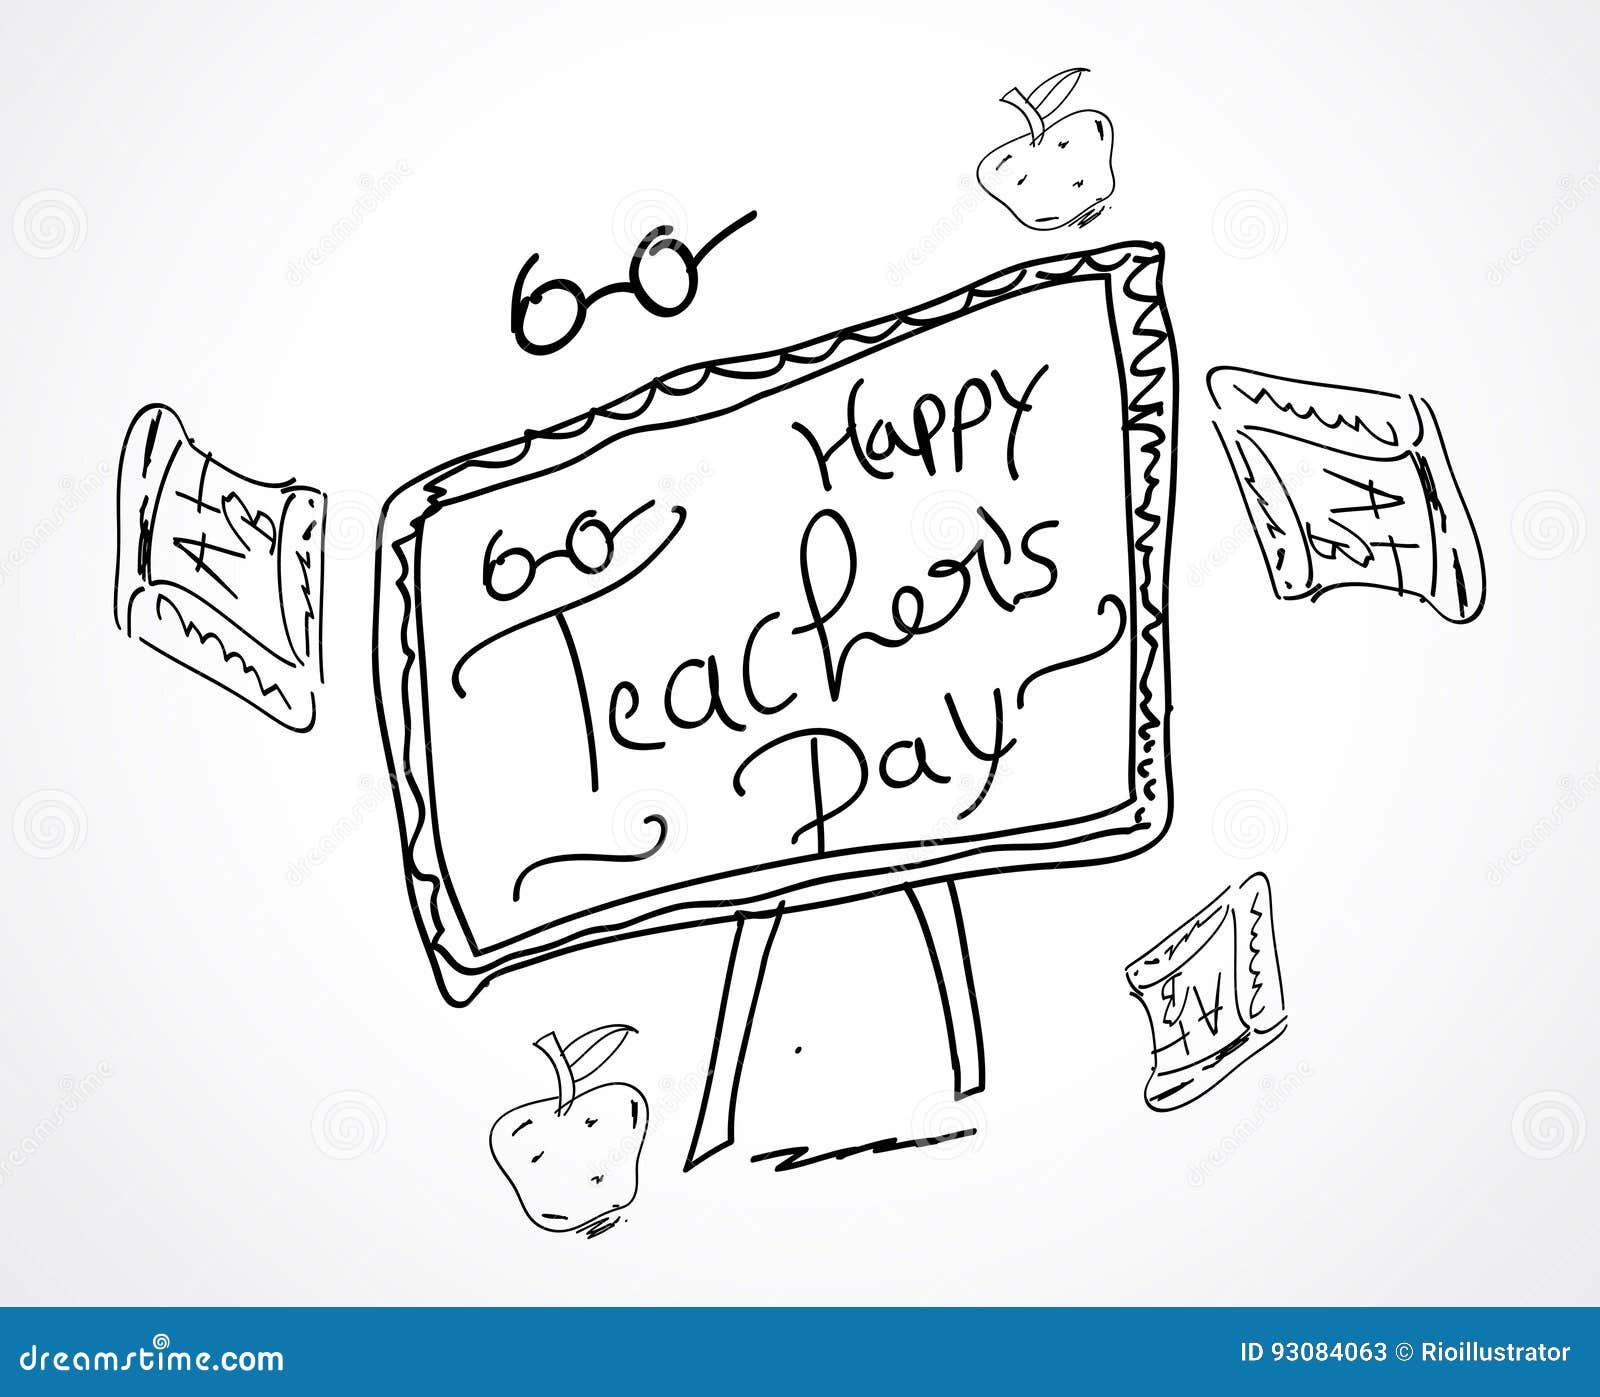 Hand Sketch Happy Teachers Day Card Design Stock Vector